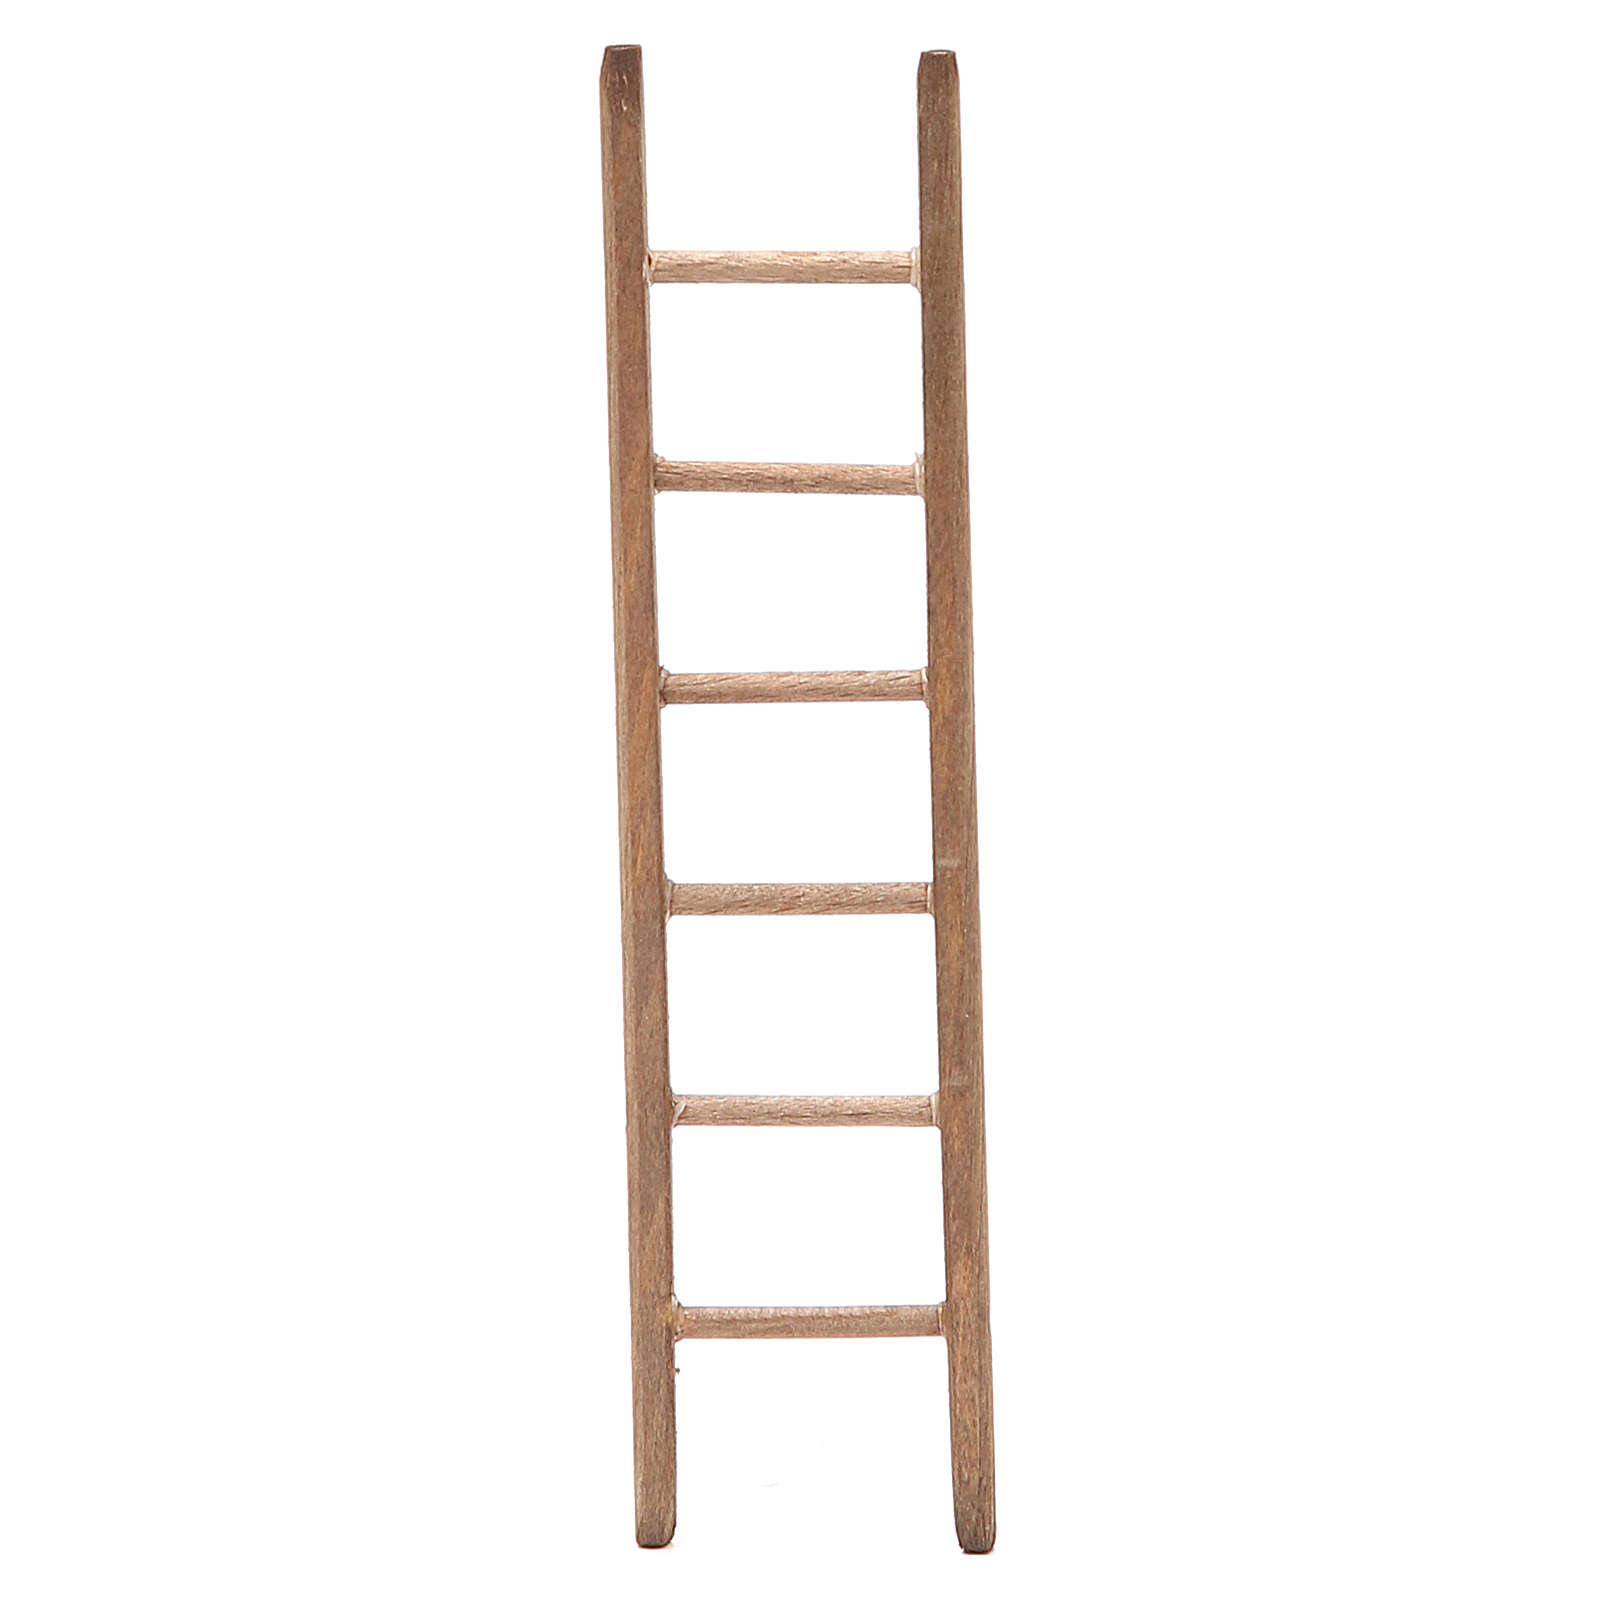 Escalera para belén de madera oscura h. 14x3,5 cm 4